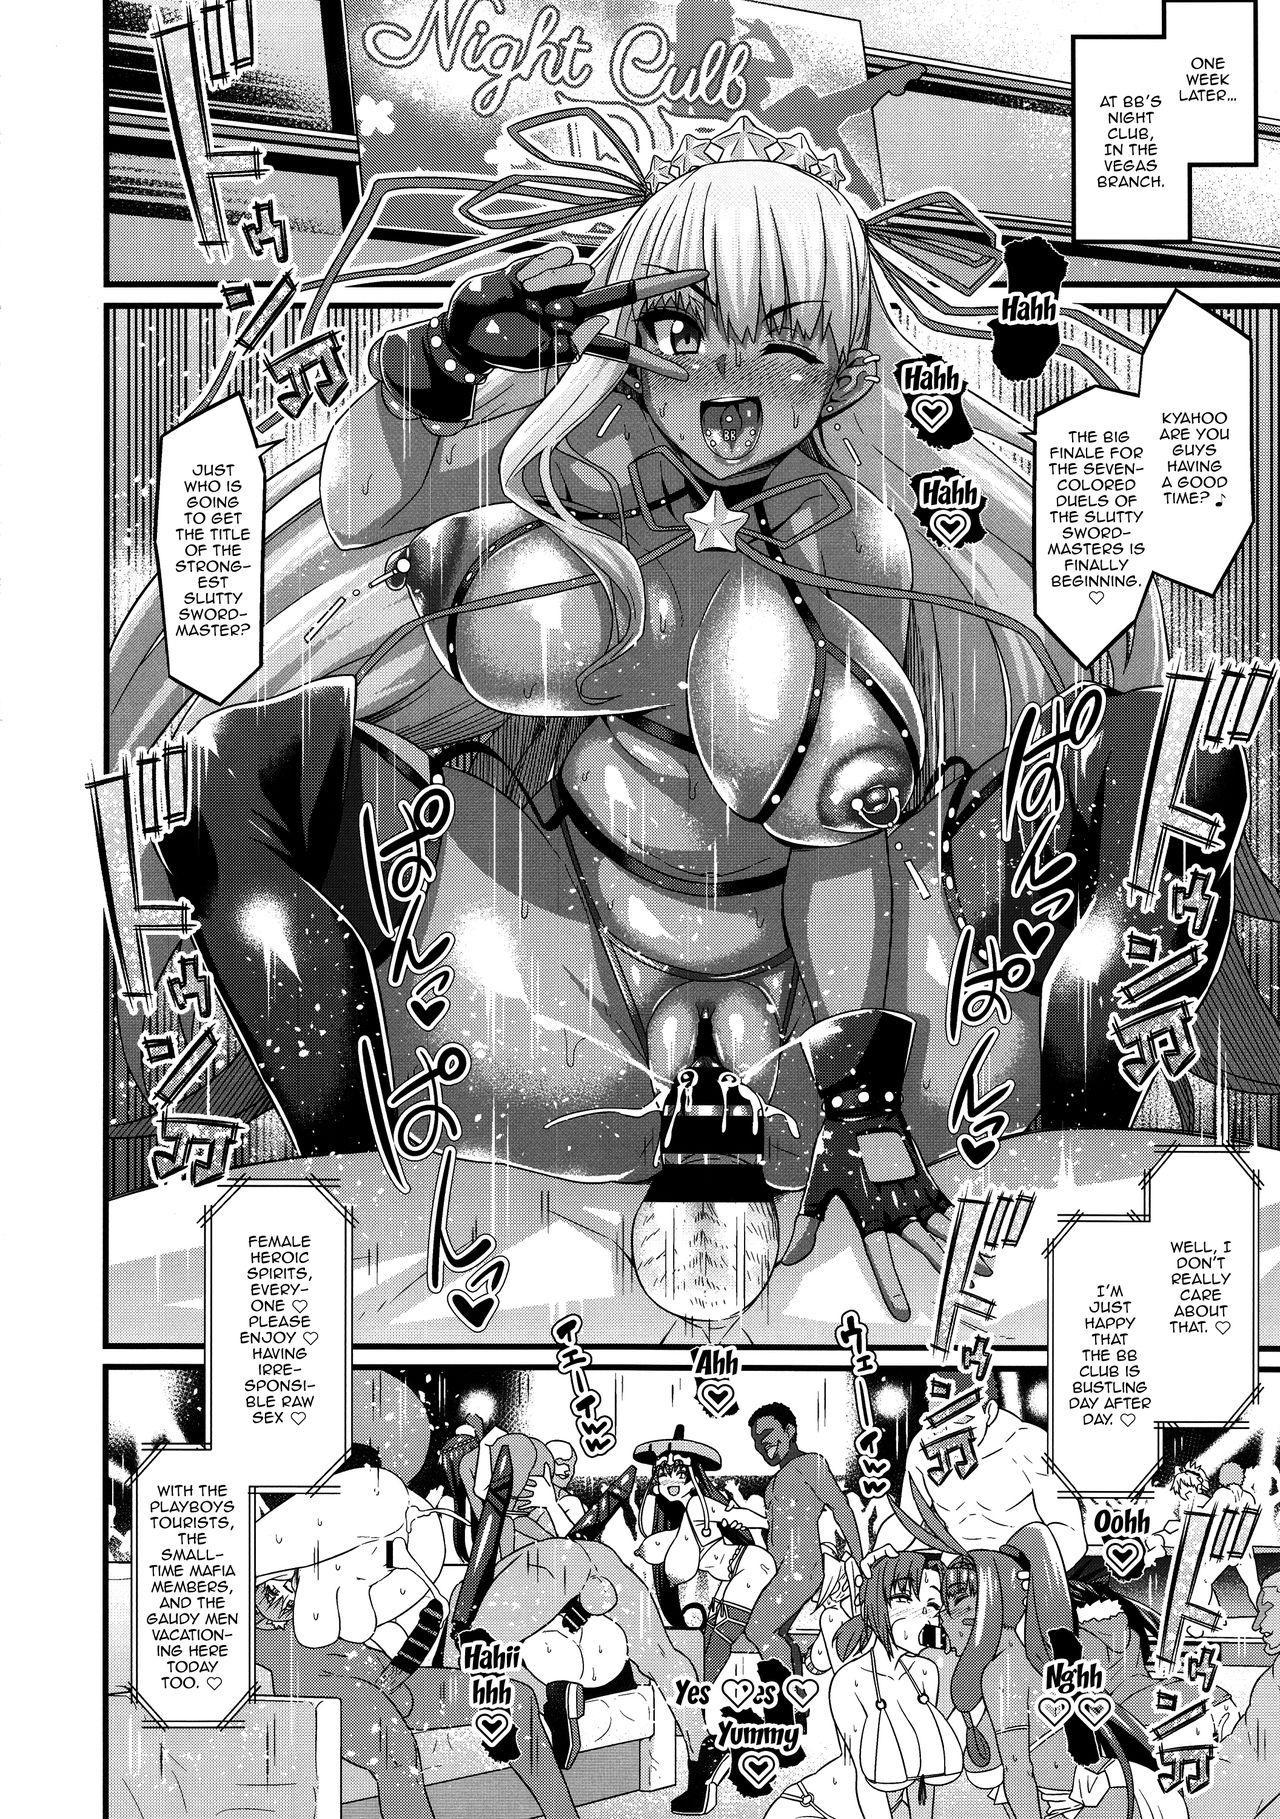 Las Vegas Bitch Kengou Sex Nanairo Shoubu   The Seven Colored Duels of the Slutty Swordmasters in Las Vegas 22